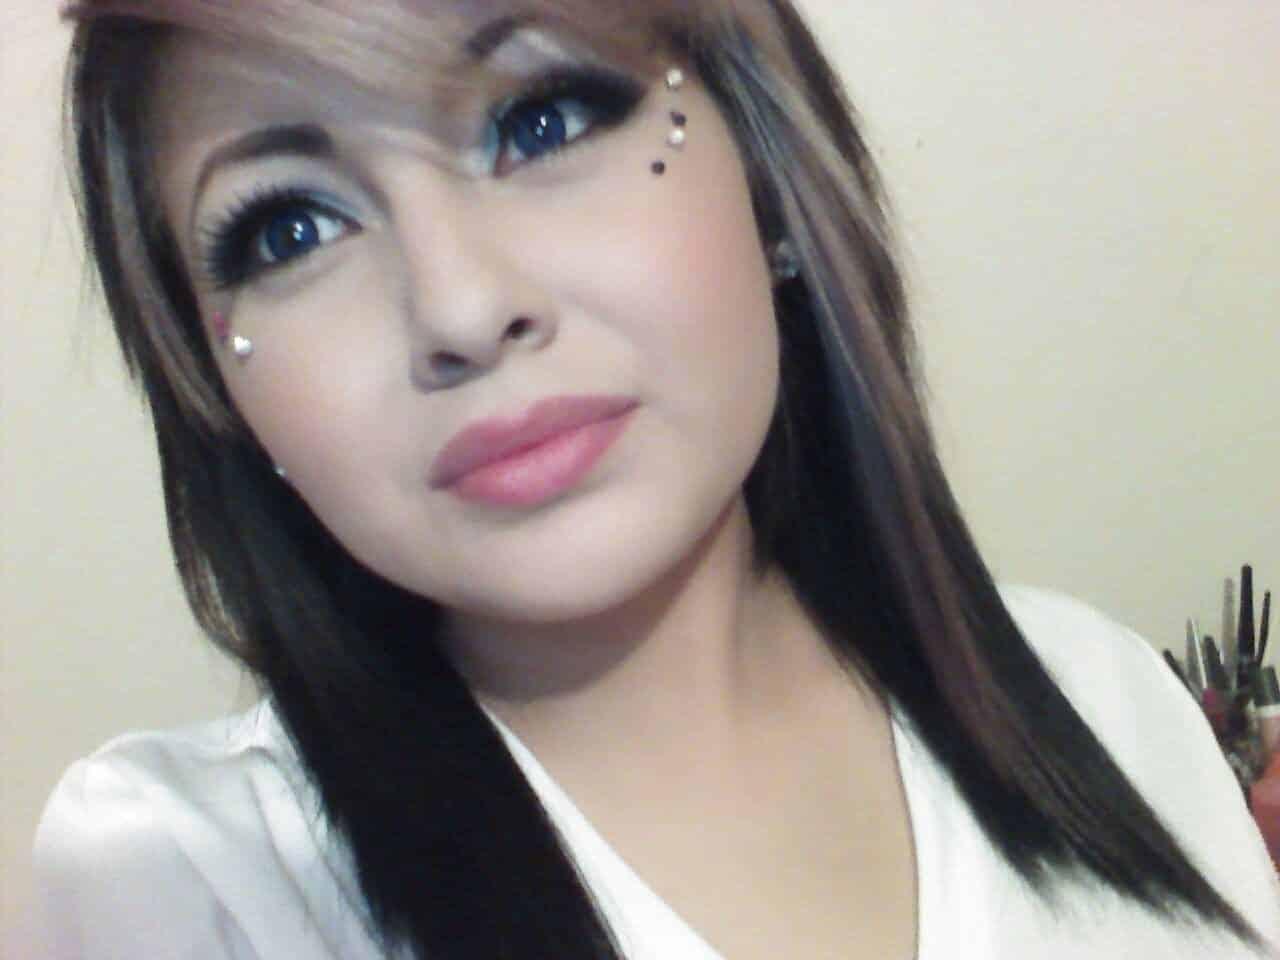 Anti Eyebrow Piercing example